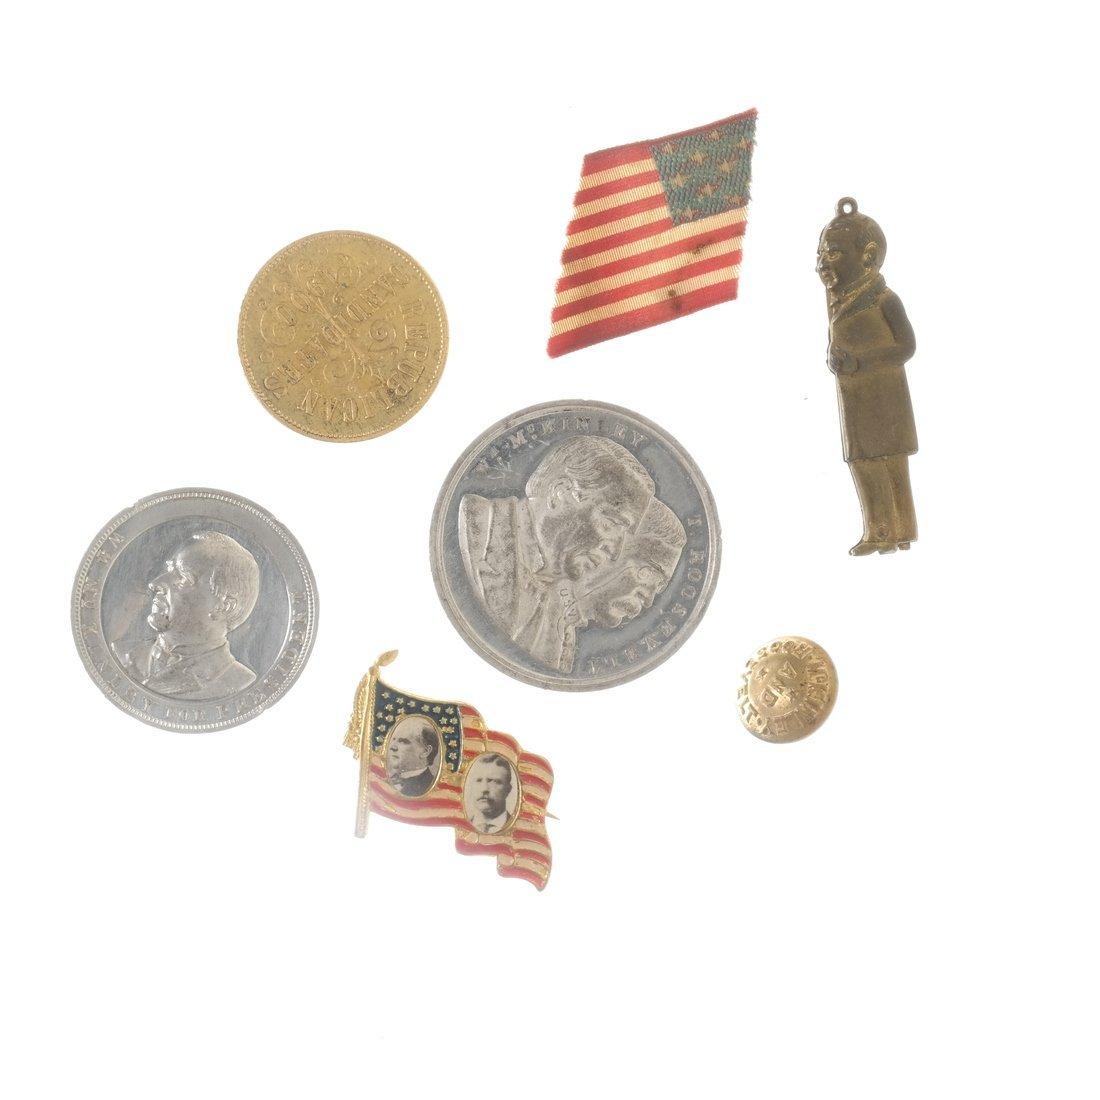 William McKinley - Campaign and Memorial Items - 6